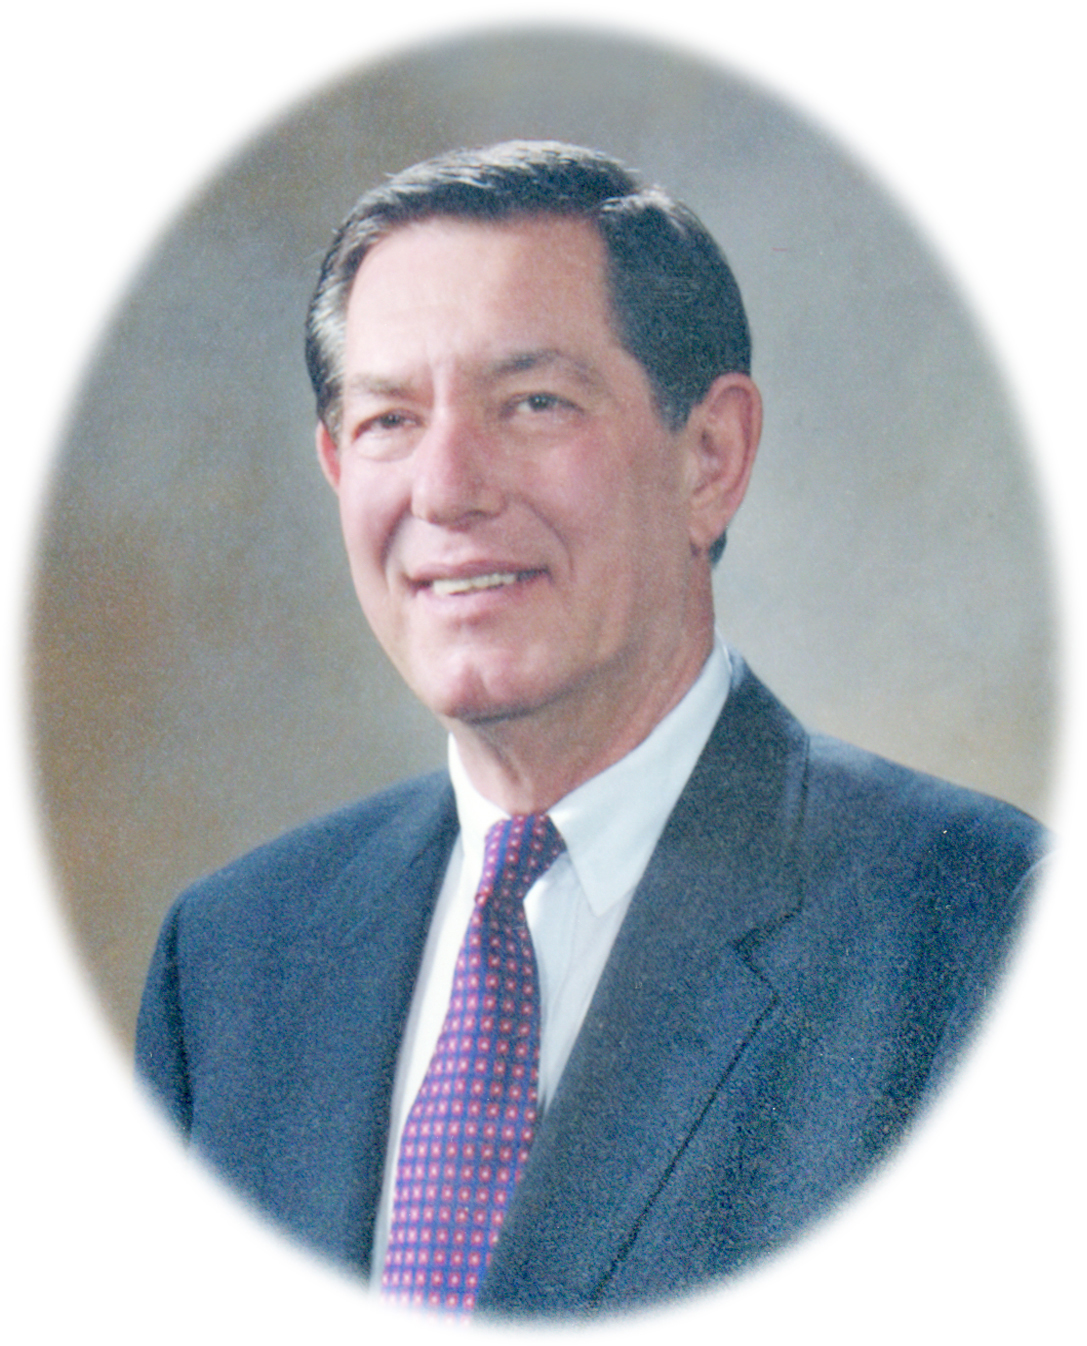 James H. Keene, III